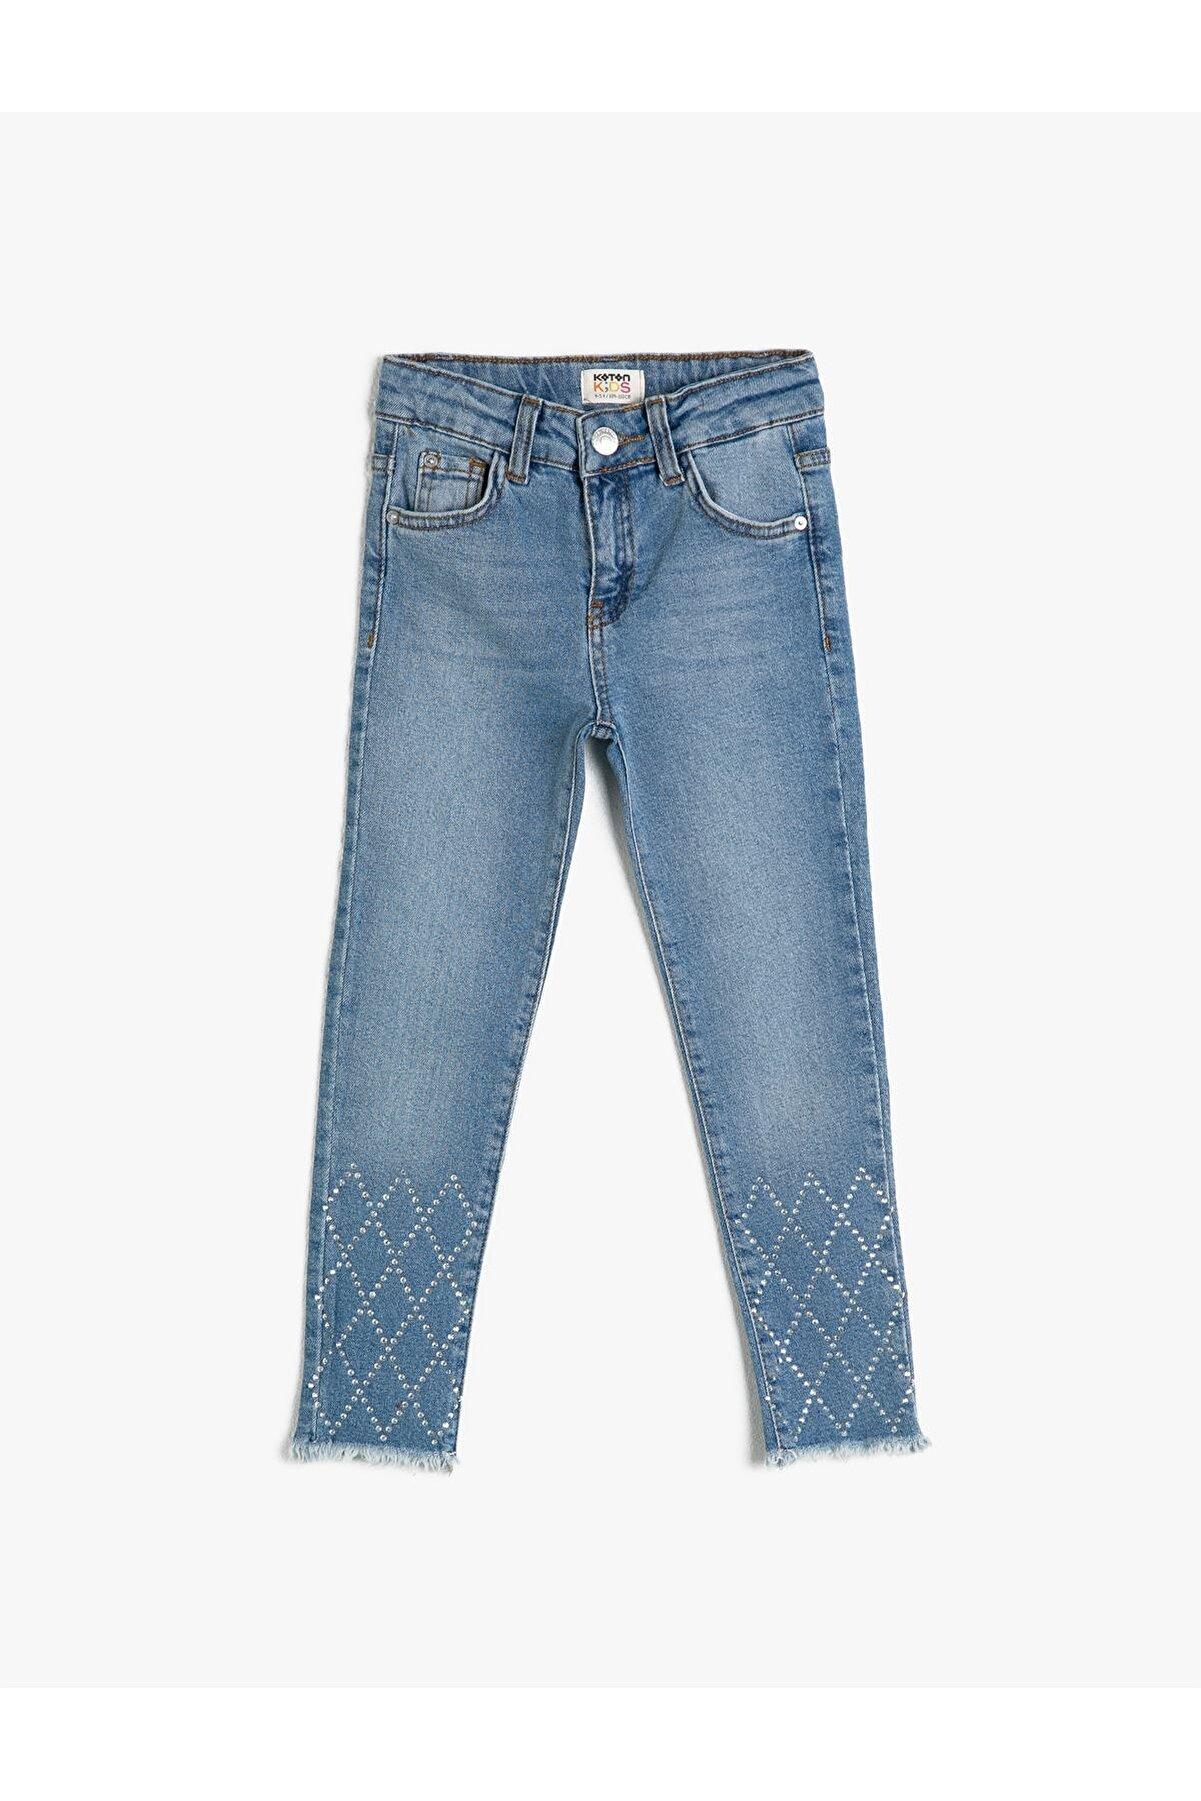 Koton Kız Çocuk Light Indigo Jeans 21KY59000530